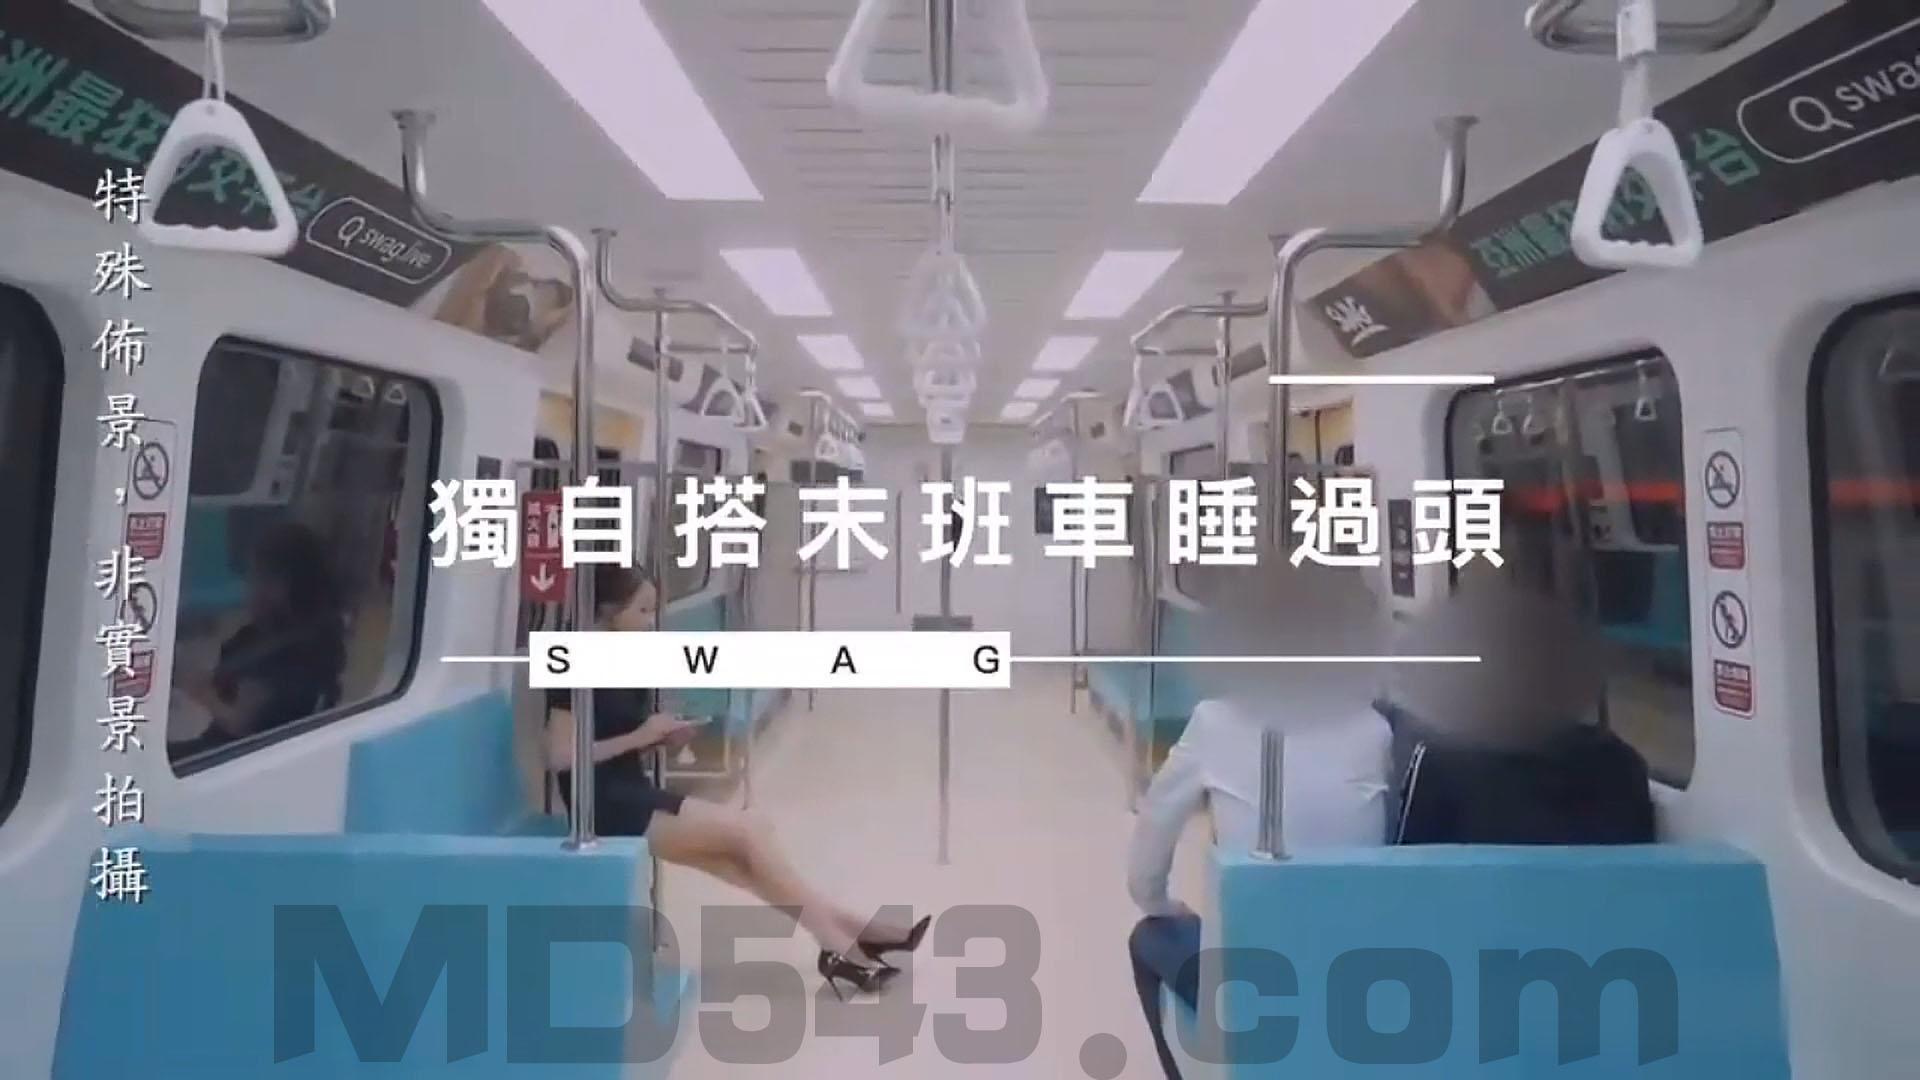 SWAG疑似在台X捷運拍片系列 捷運車廂之獨自搭末班車睡過頭